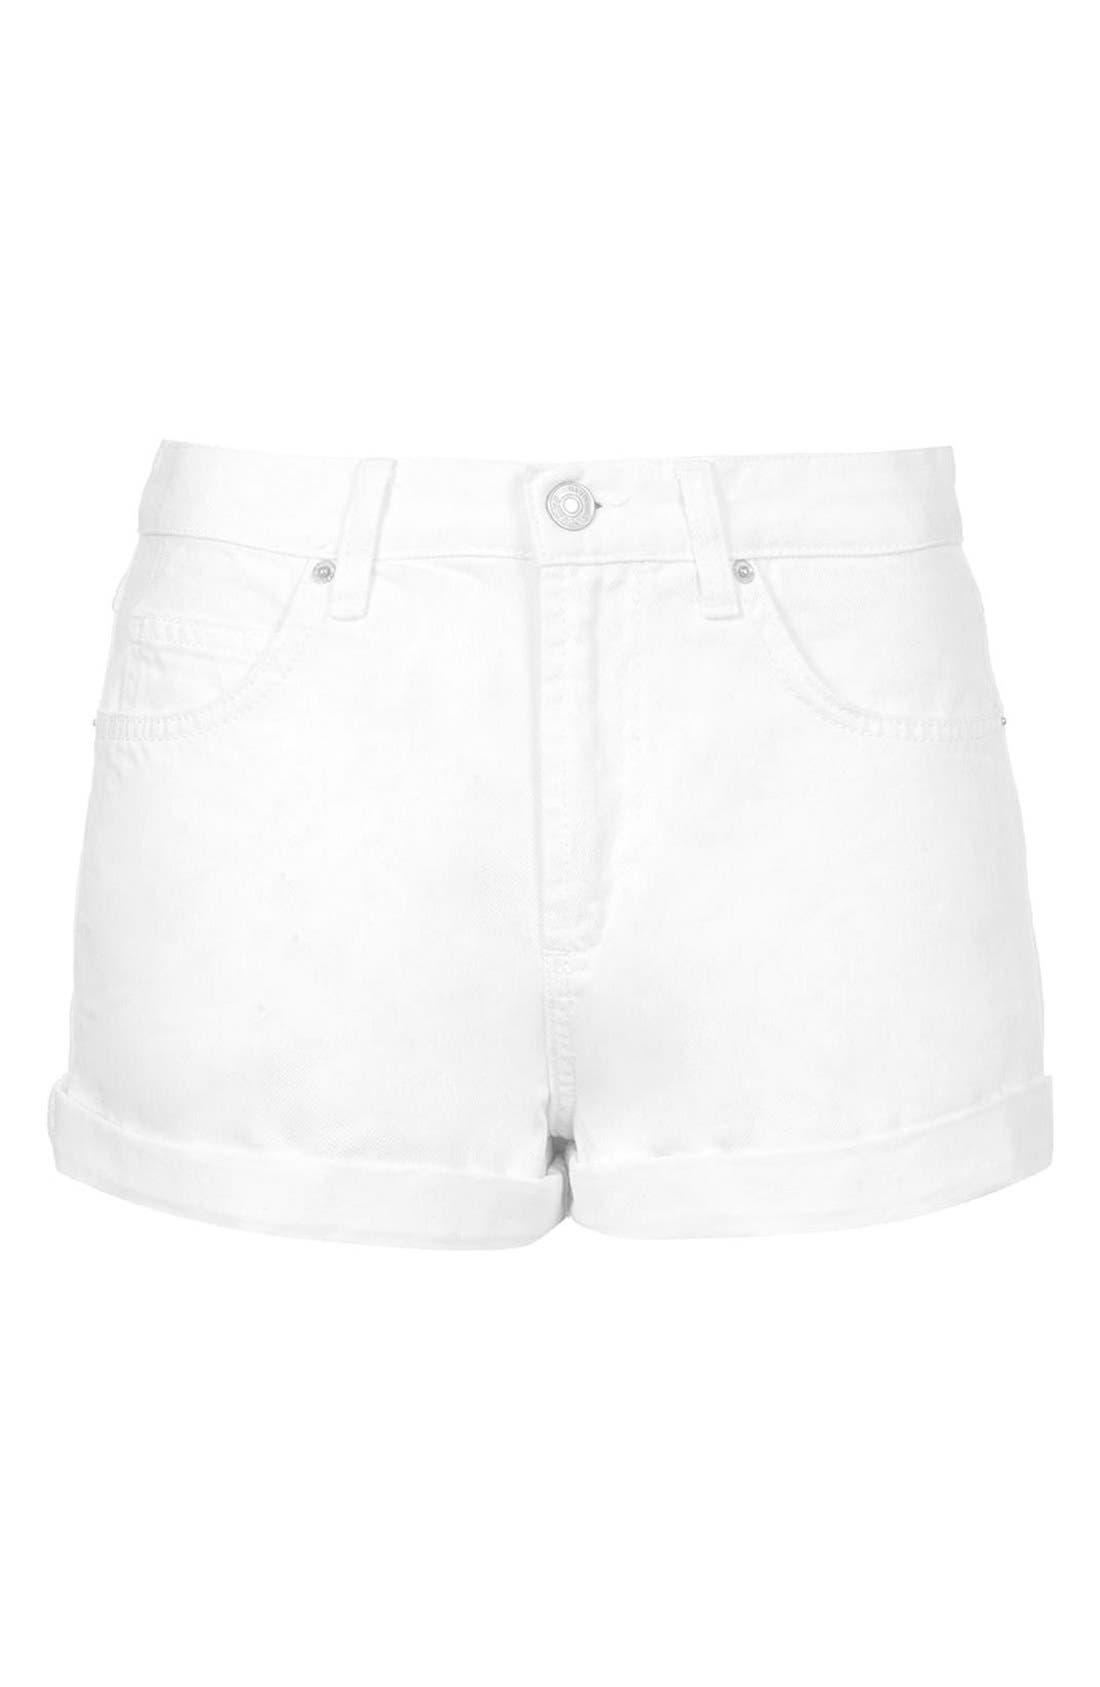 Alternate Image 3  - Topshop Moto 'Rosa' Cuffed Denim Shorts (White)